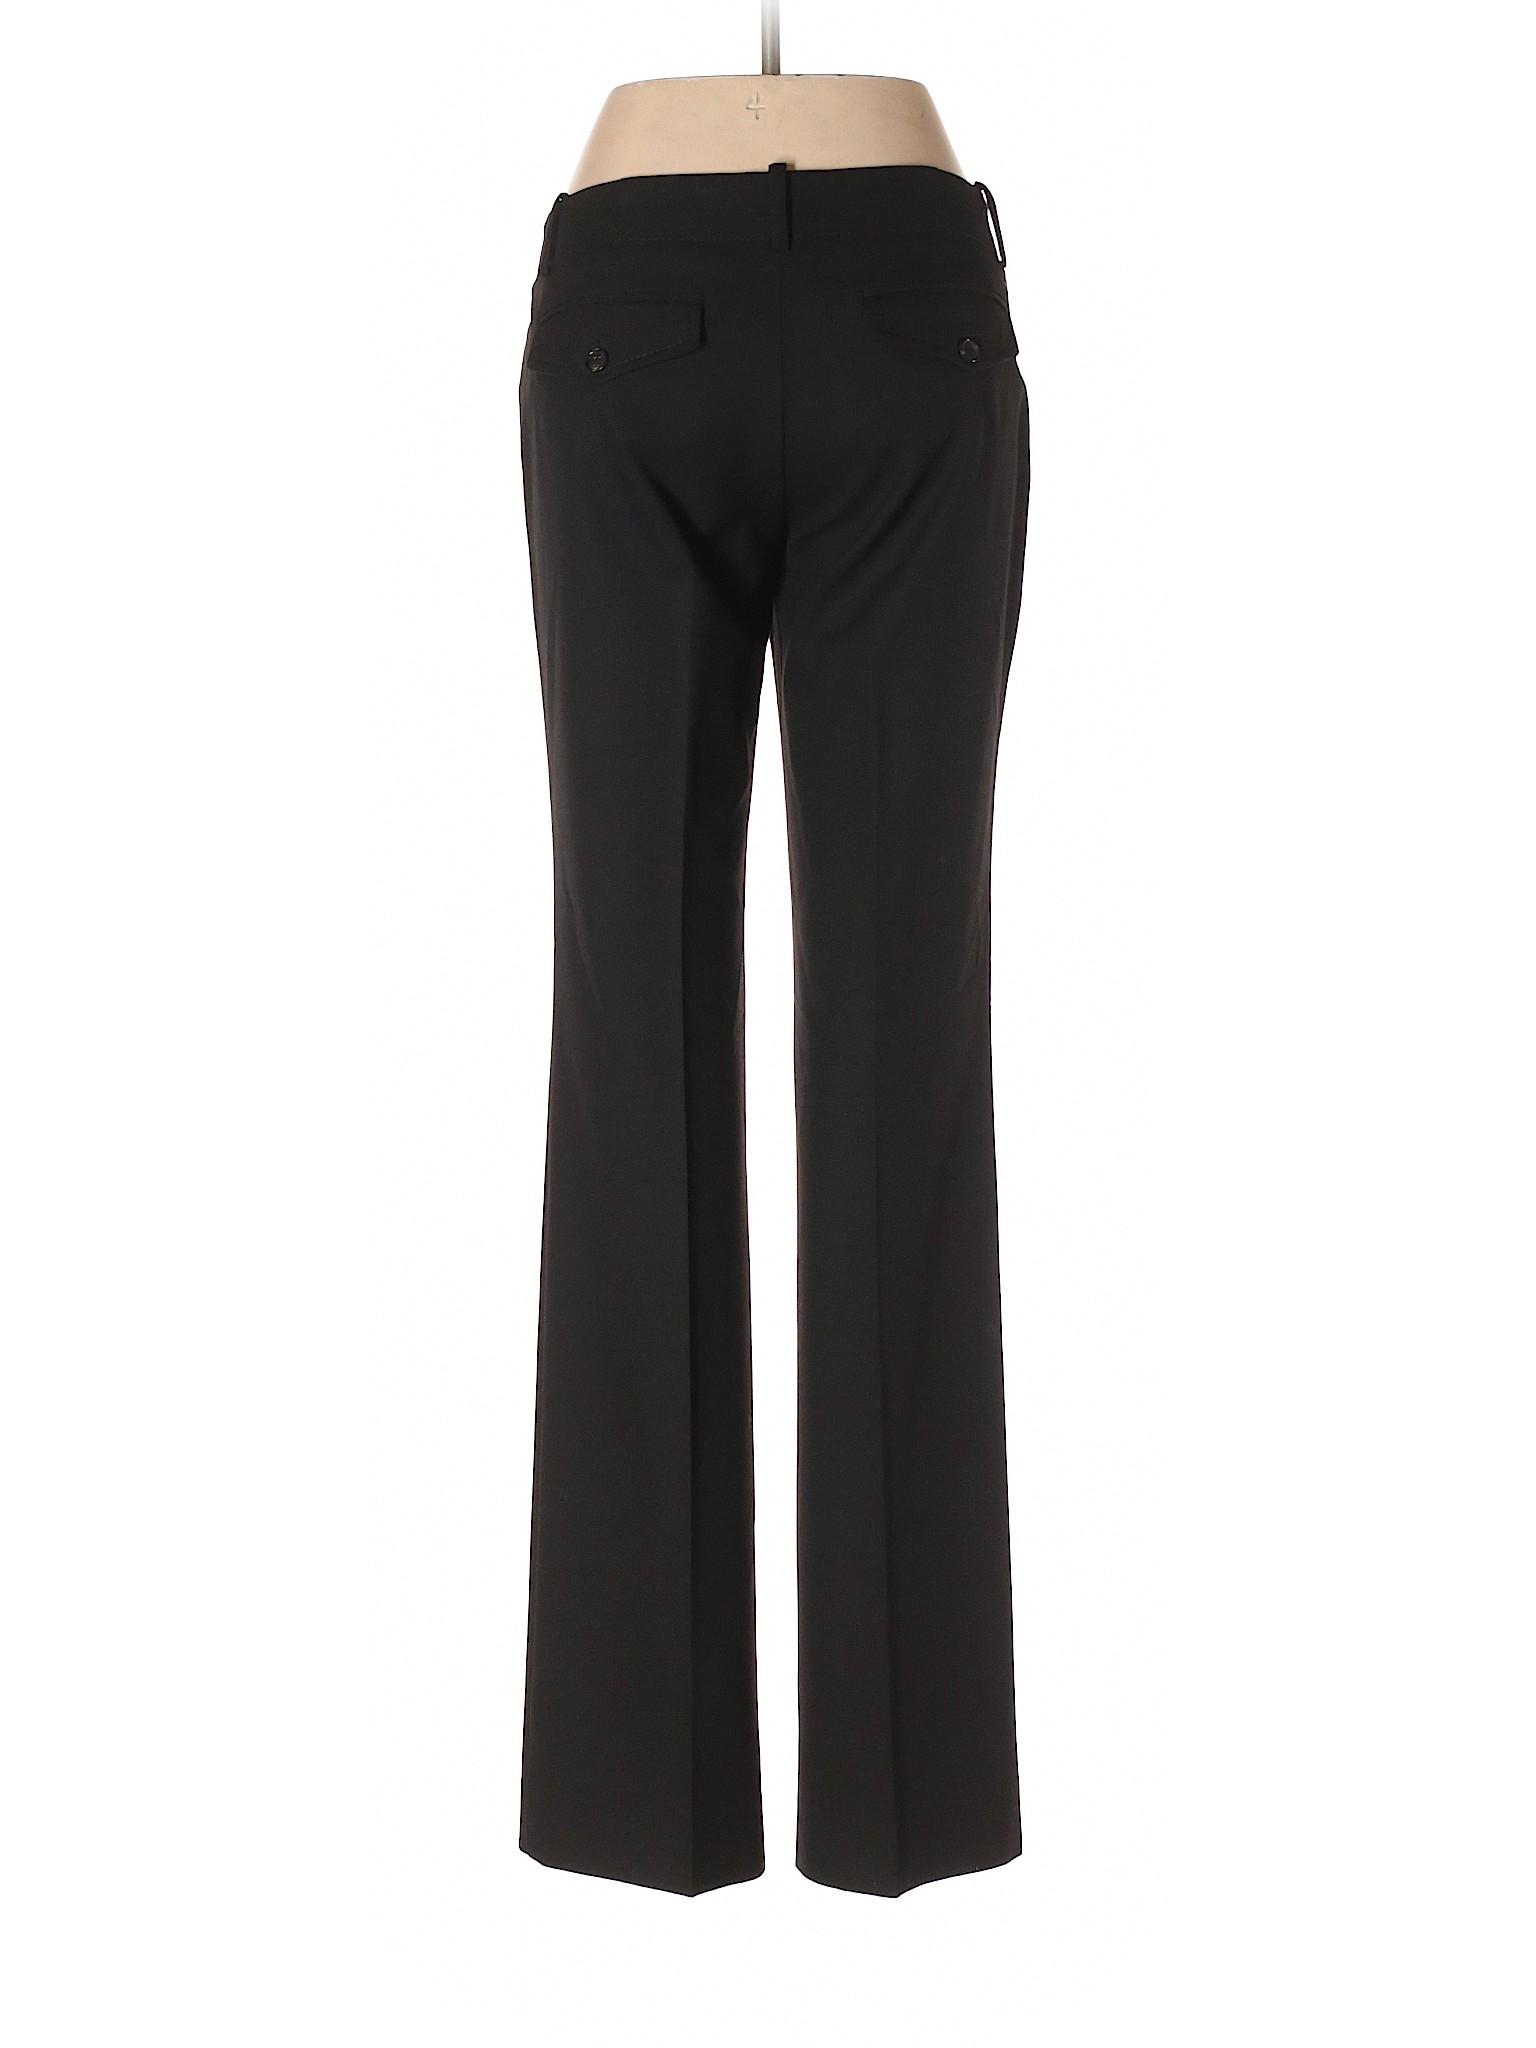 Dress Boutique The leisure Pants Limited gtwBfwqxU